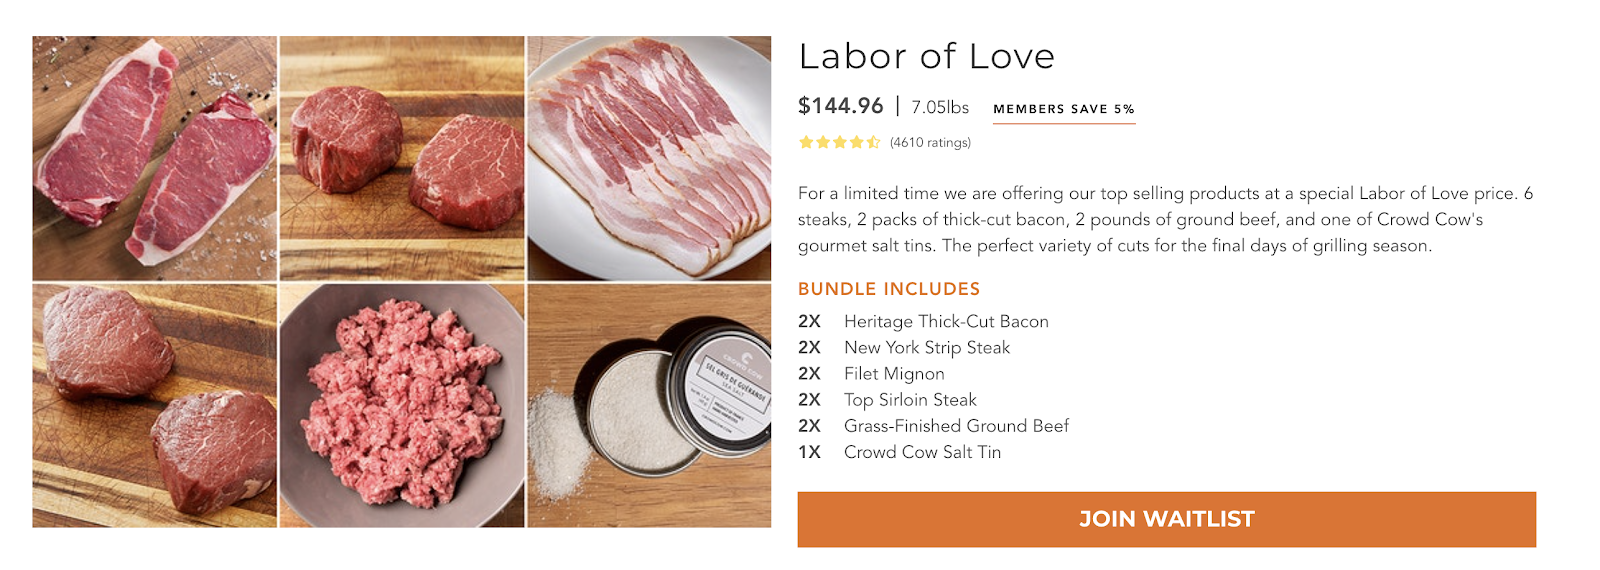 Crowd Cow's Labor of Love Bundle